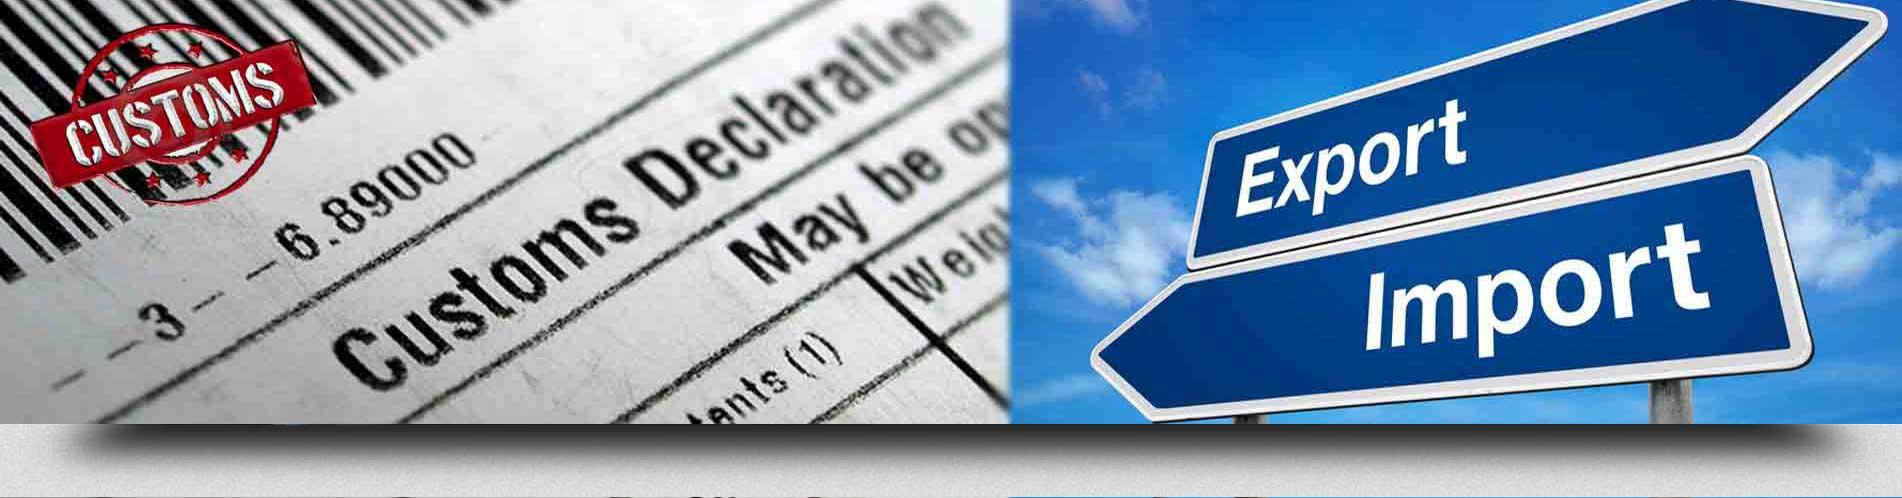 Customs-Legislations